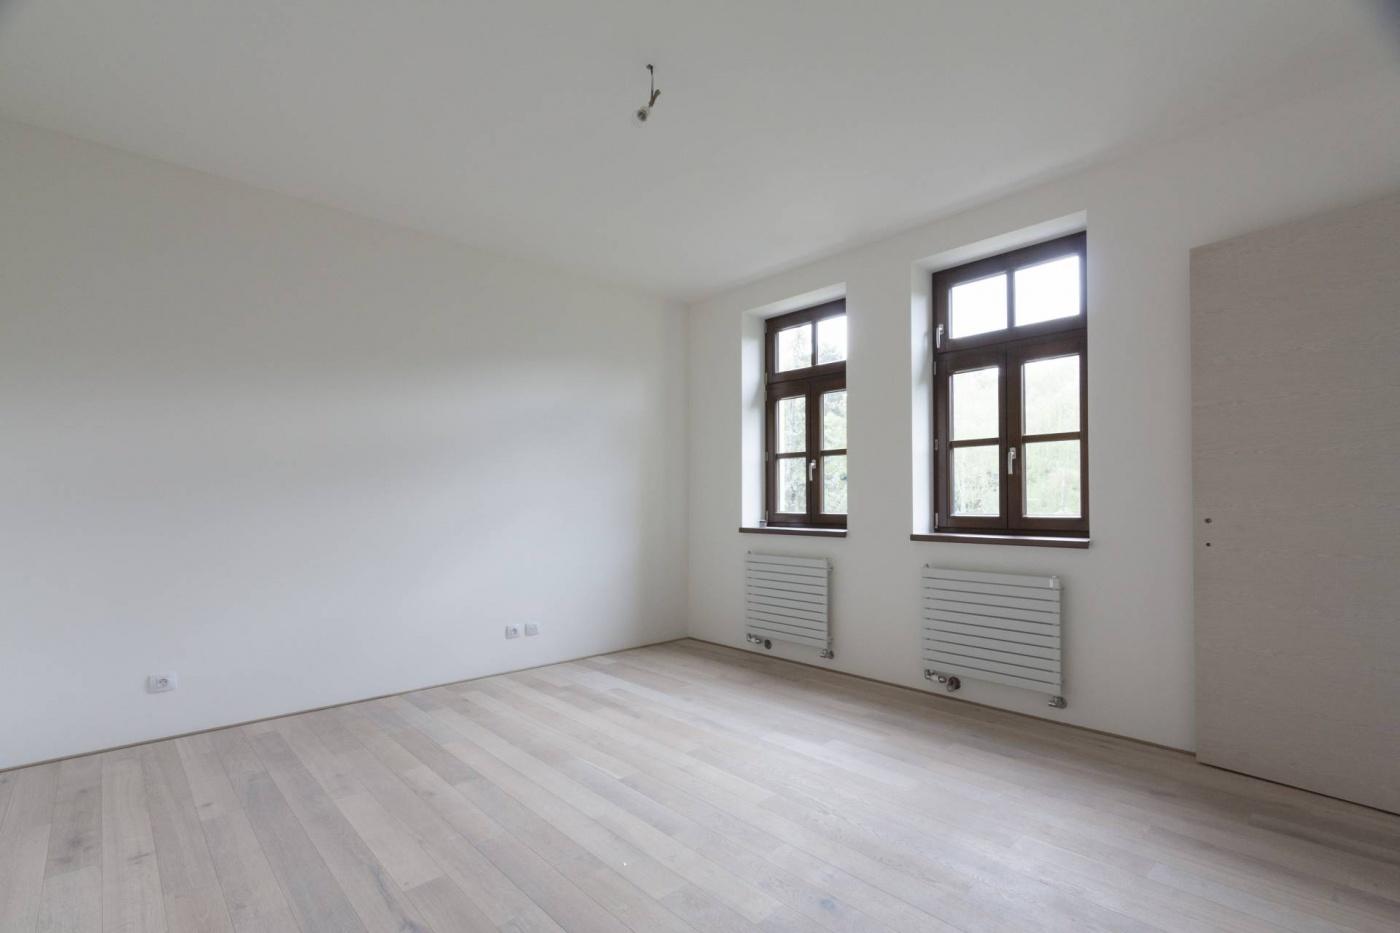 Půdní byt 2+kk, plocha 79 m², ulice Lumírova, Praha 2 - Vyšehrad   2